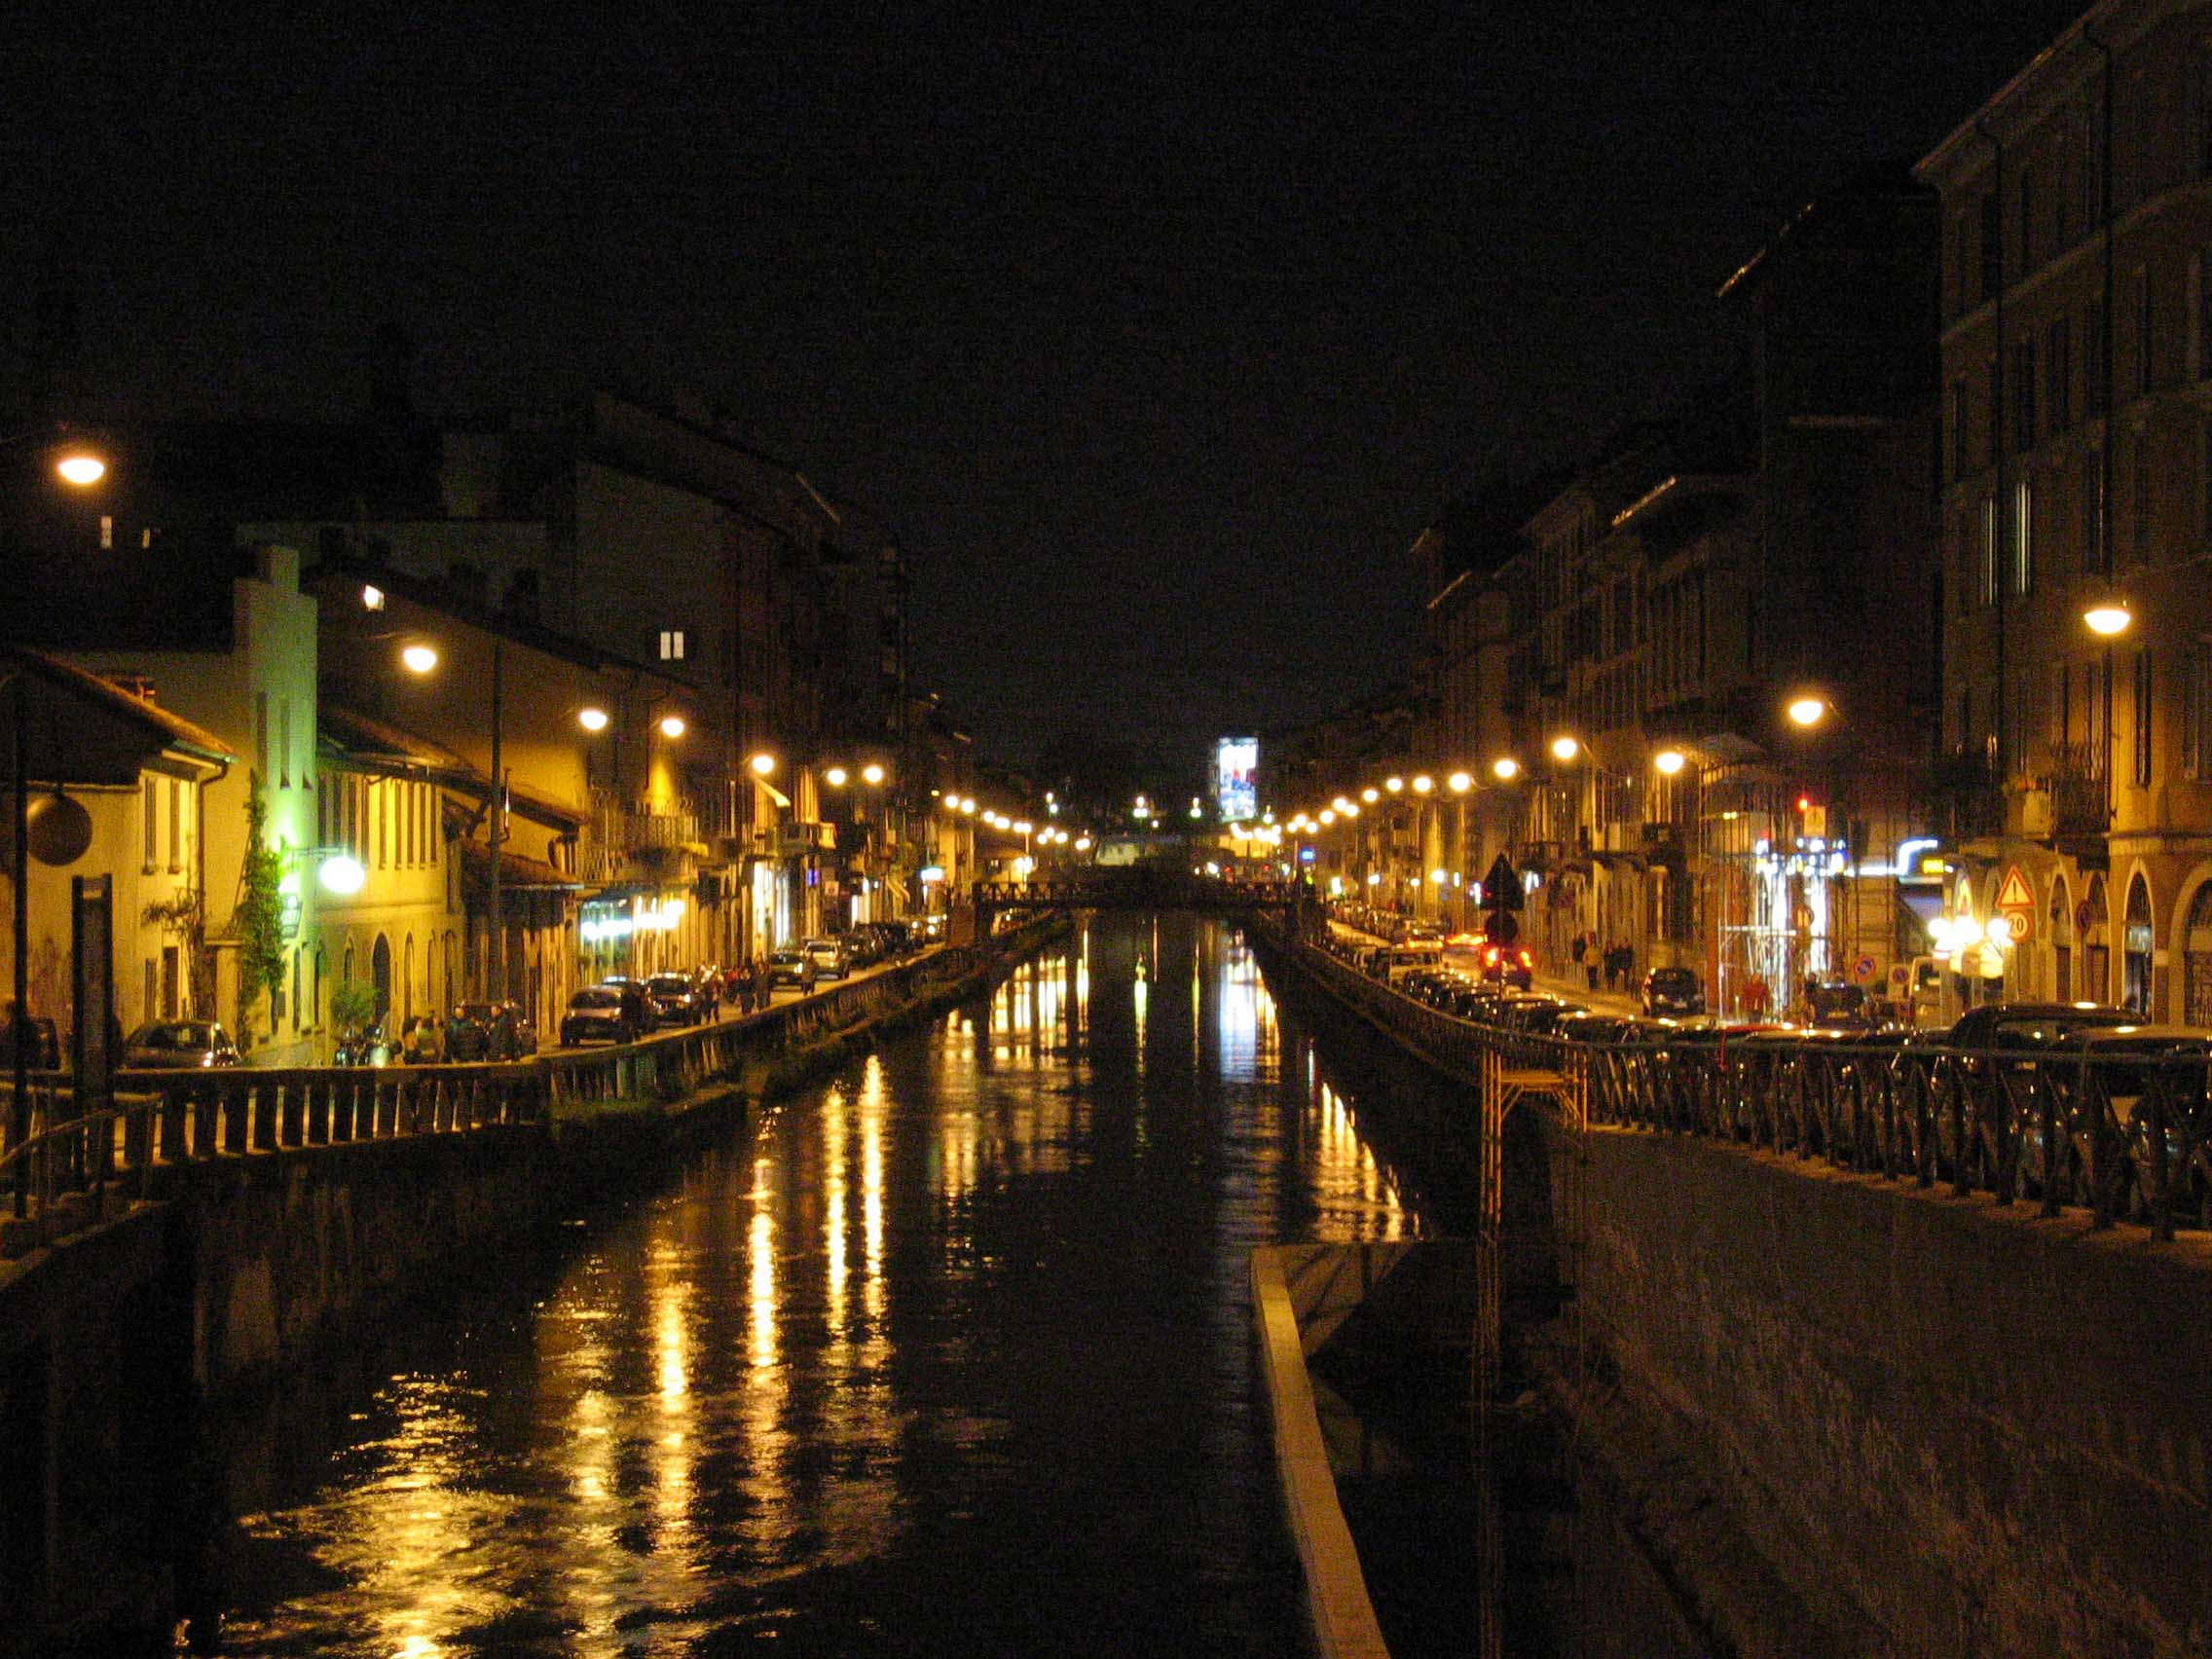 Hotel Pavia Roma Recensioni